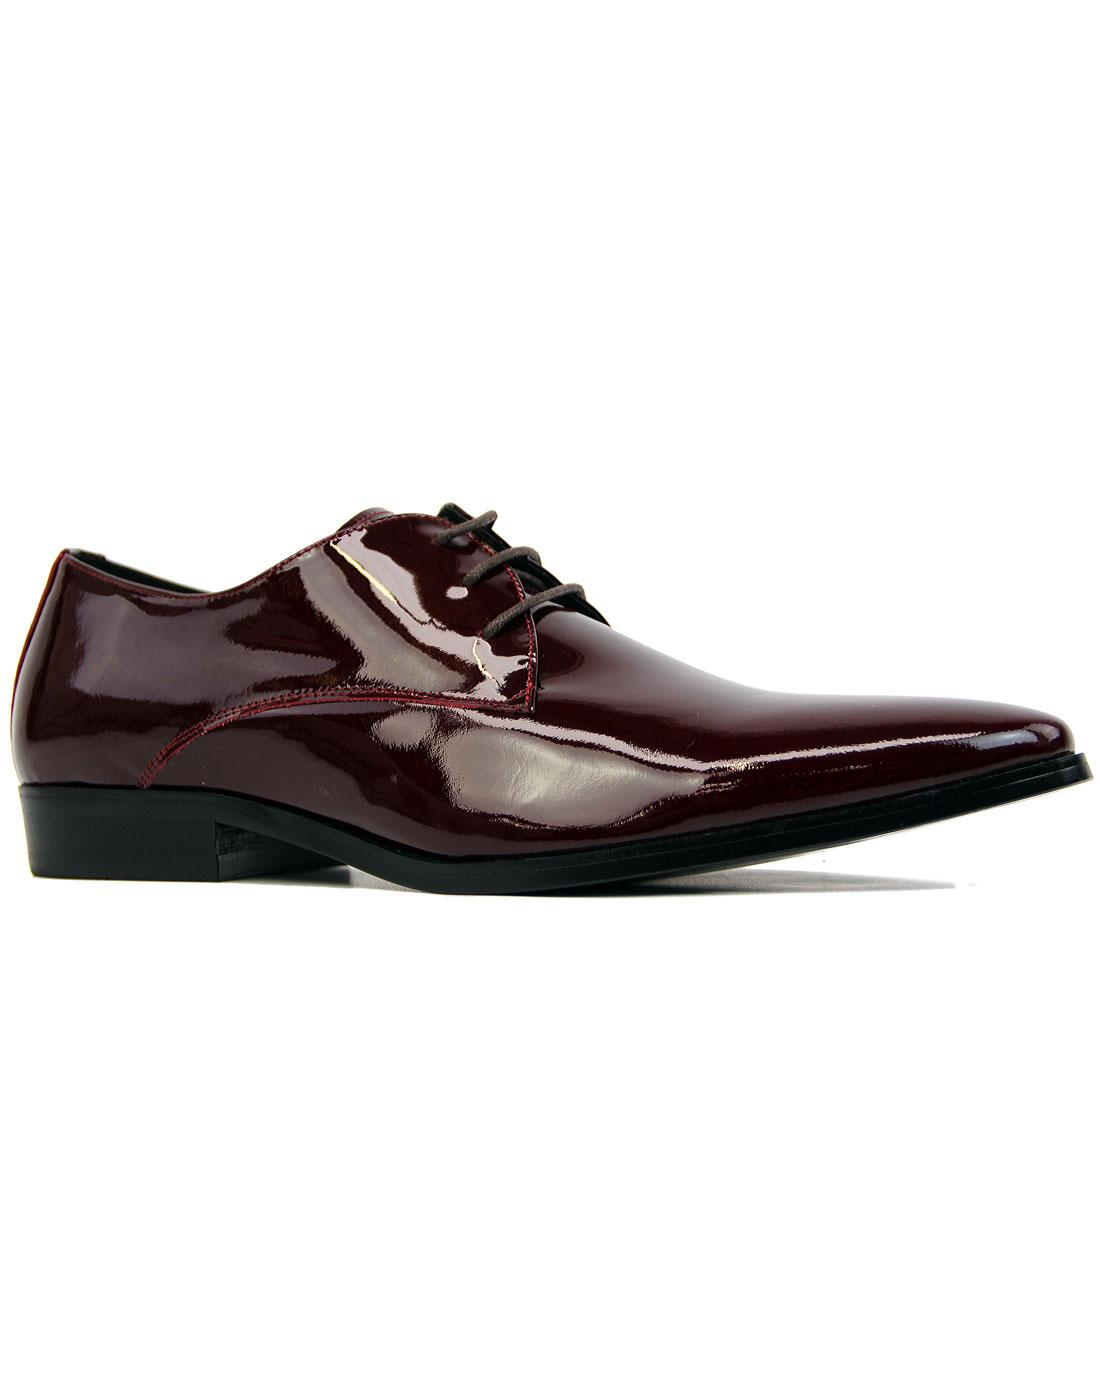 Sai Lace PAOLO VANDINI Patent Leather Shoes BORDO